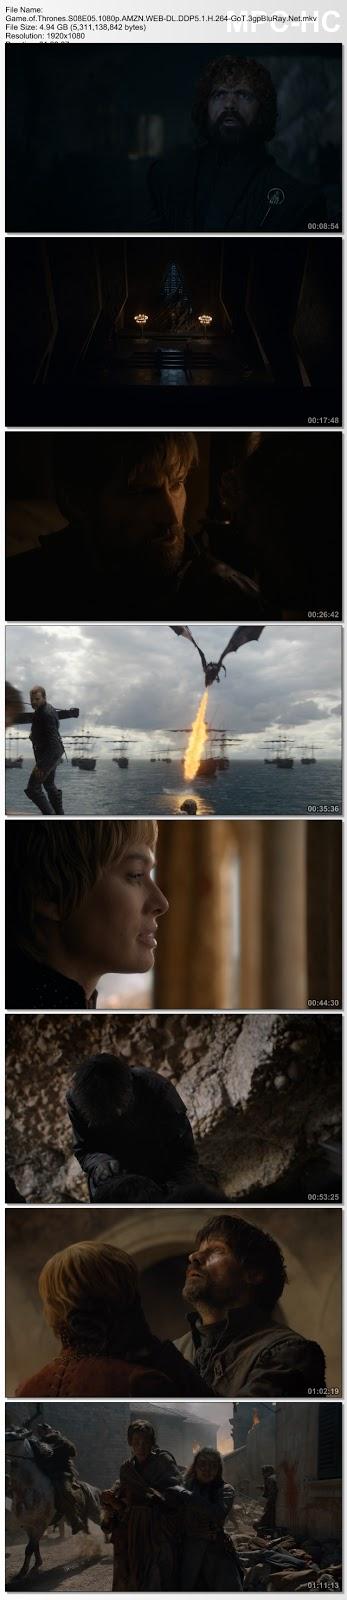 Screenshots Download Game.of.Thrones.S08E05.1080p.AMZN.WEB-DL.DDP5.1.H.264-GoT.3gpBluRay.Net.mkv